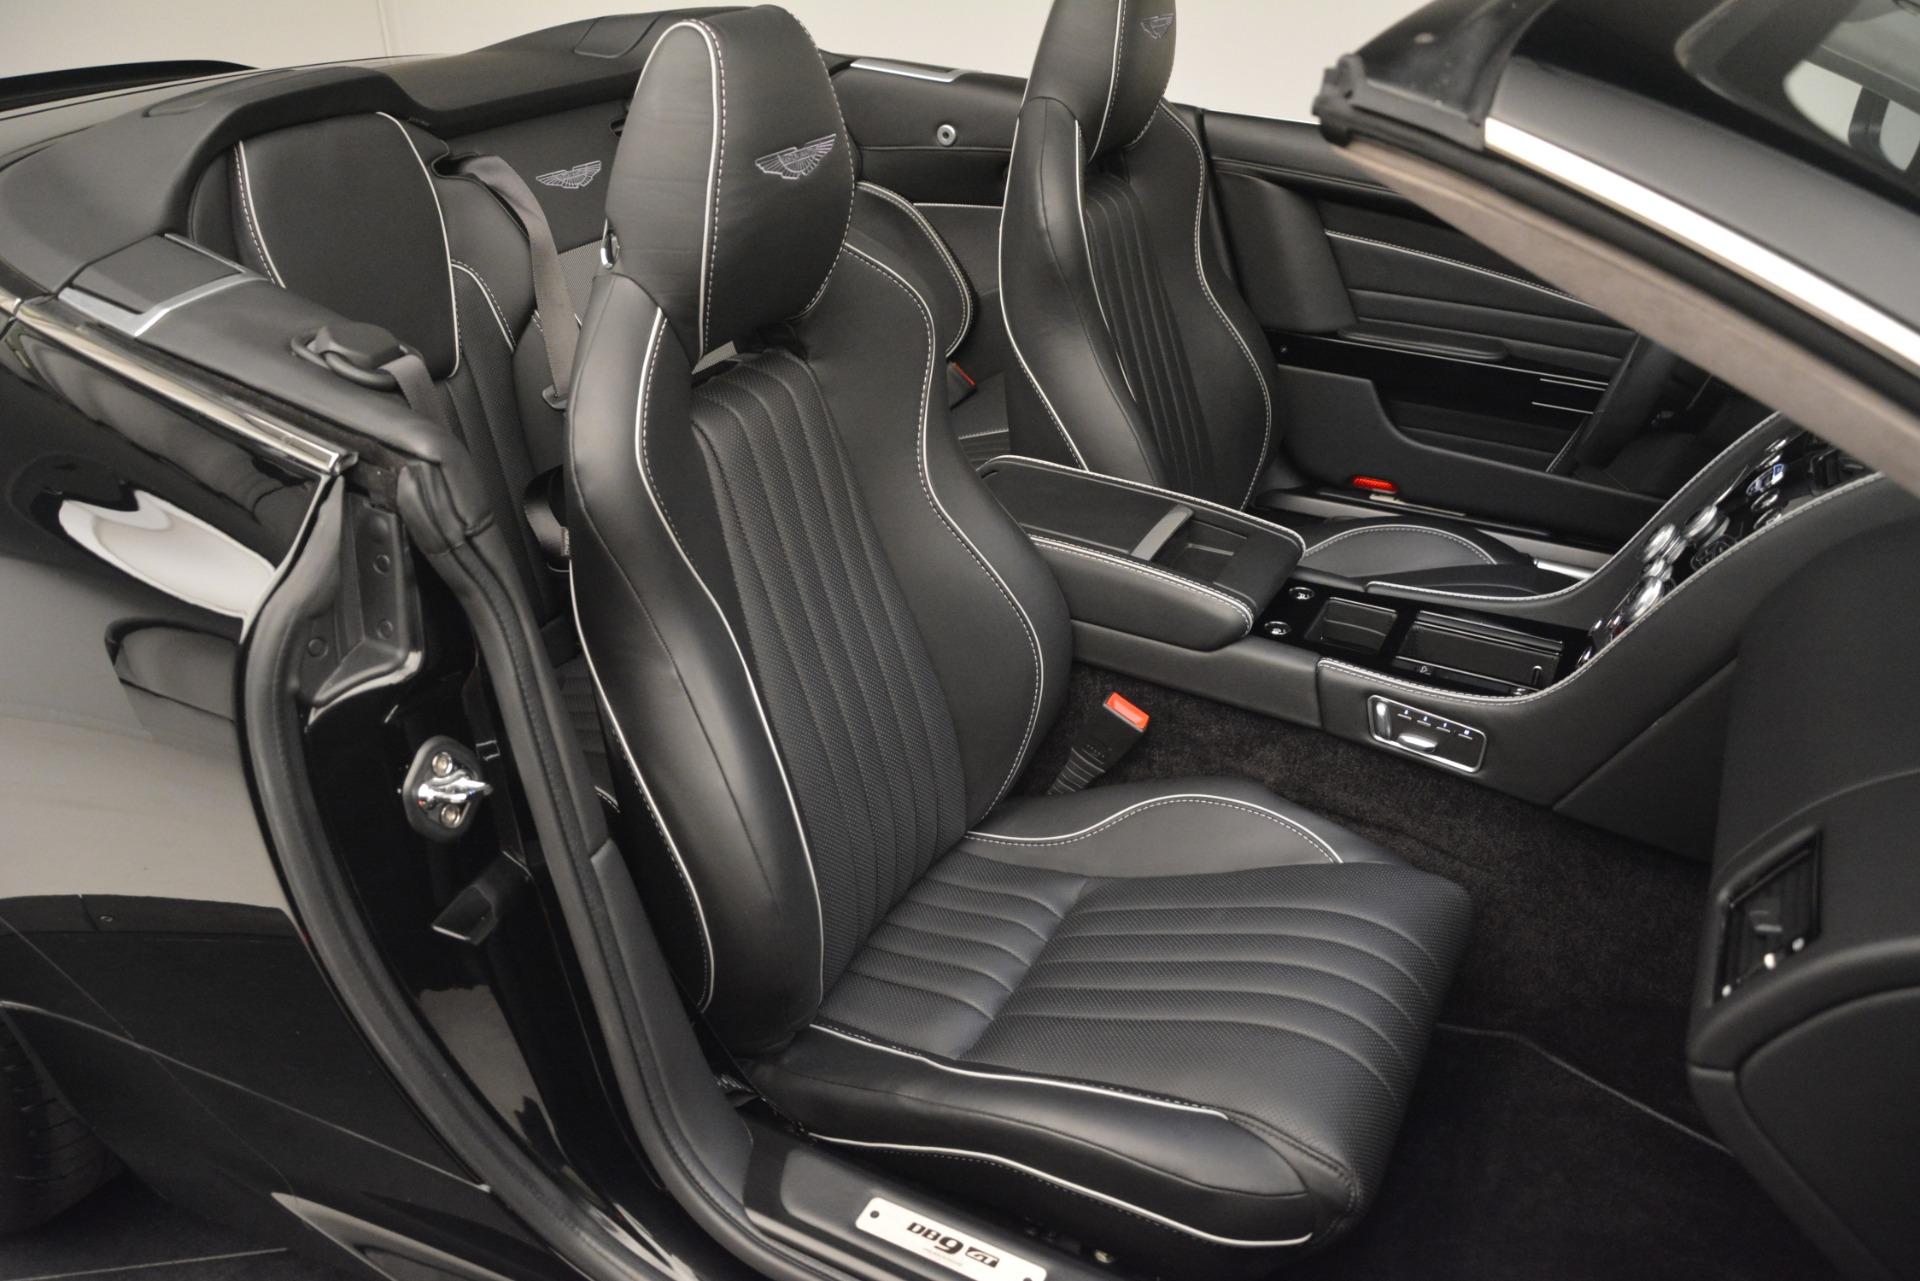 Used 2016 Aston Martin DB9 Convertible For Sale In Greenwich, CT. Alfa Romeo of Greenwich, 7495 2971_p22